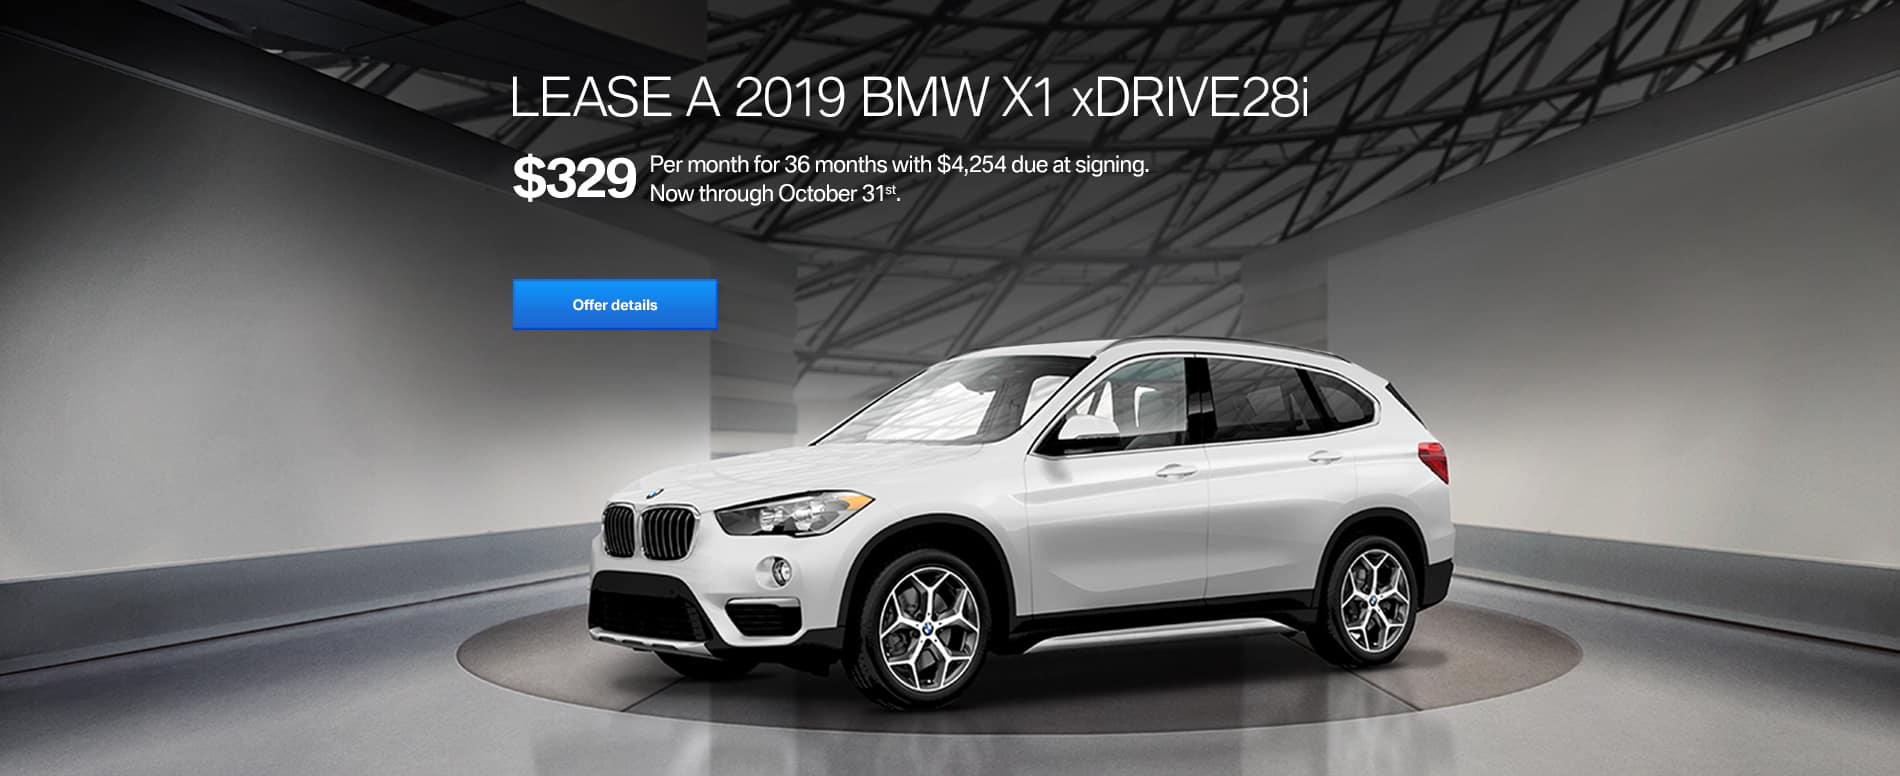 OCT_PUSH_BMW_X1_xDrive28i_329